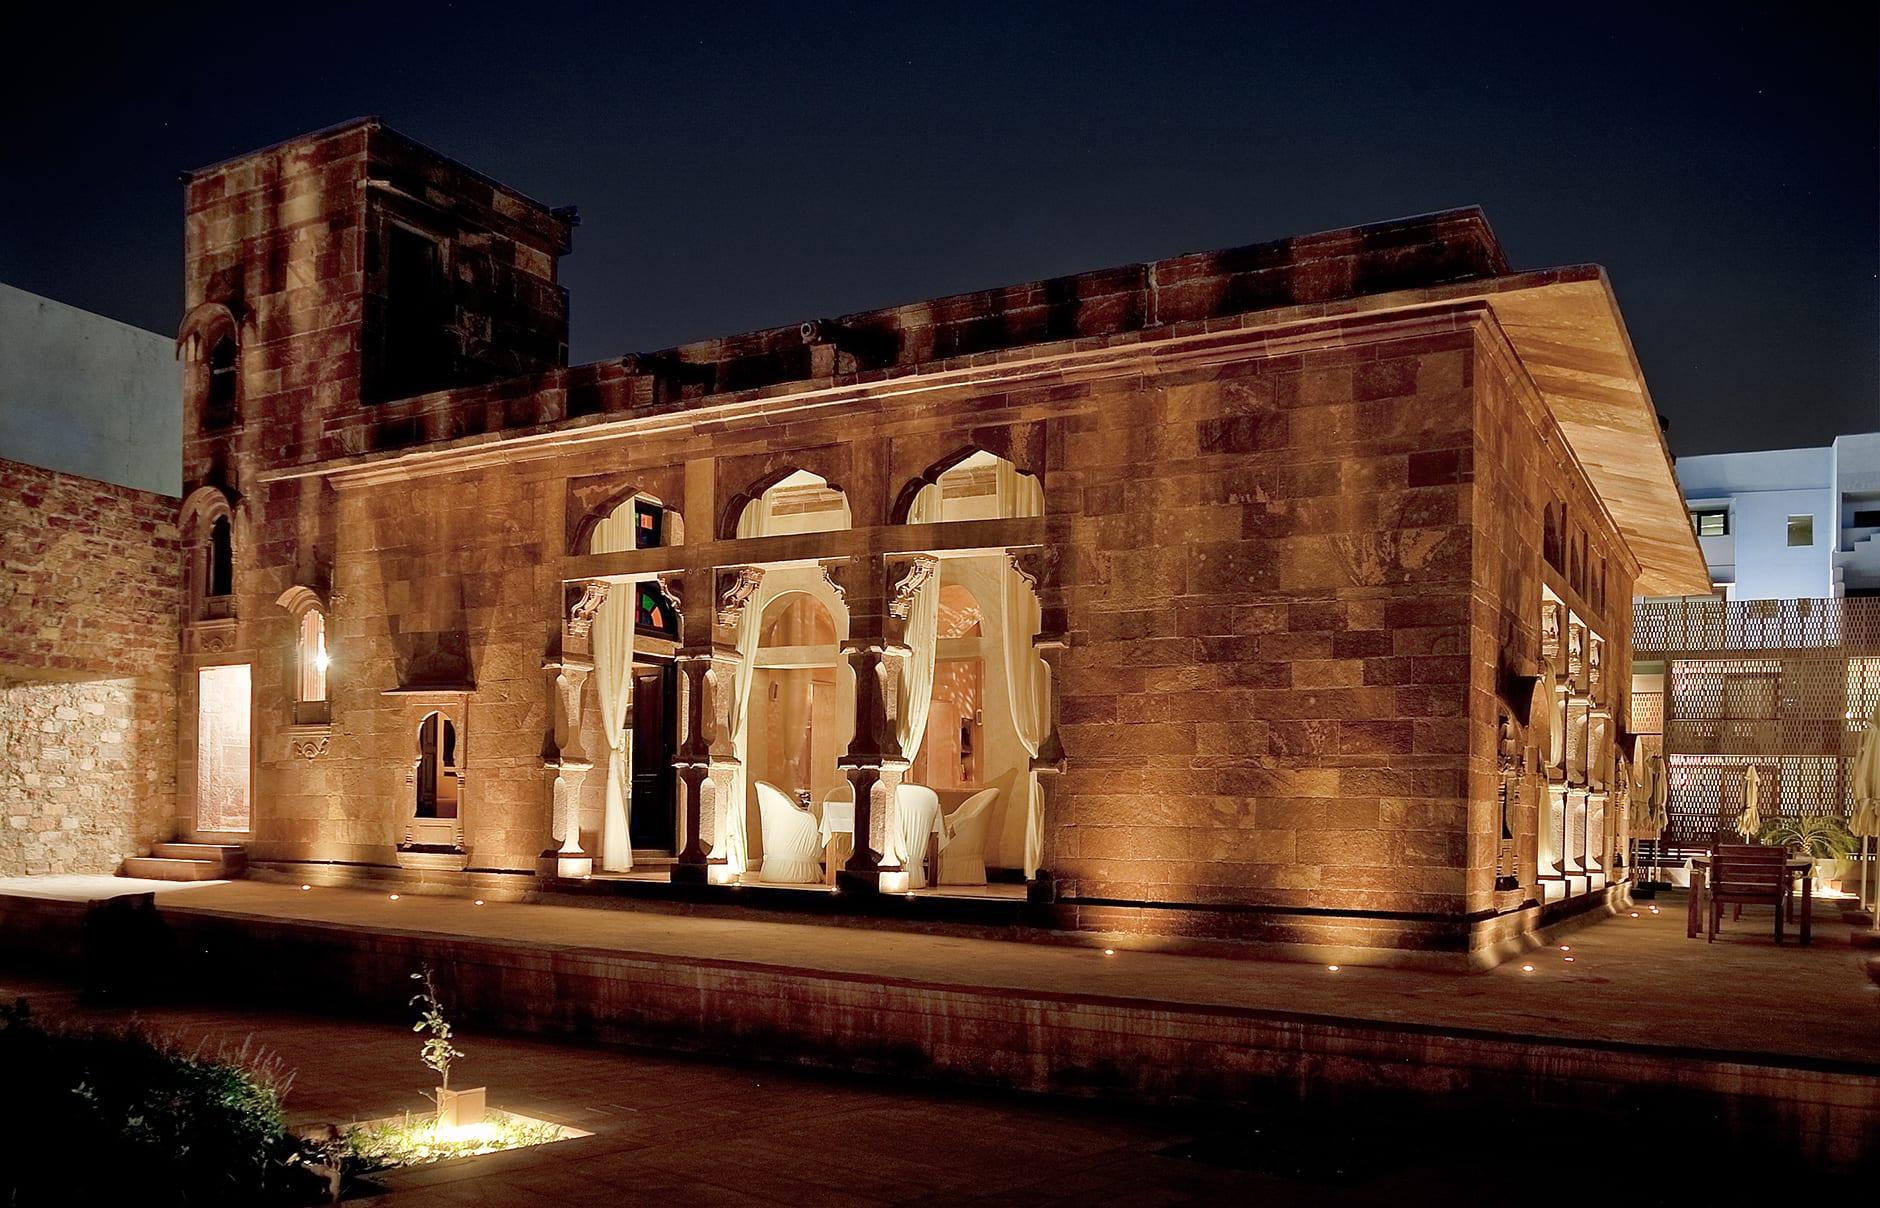 Baradari Restaurant. Raas Jodhpur, India. © Rass